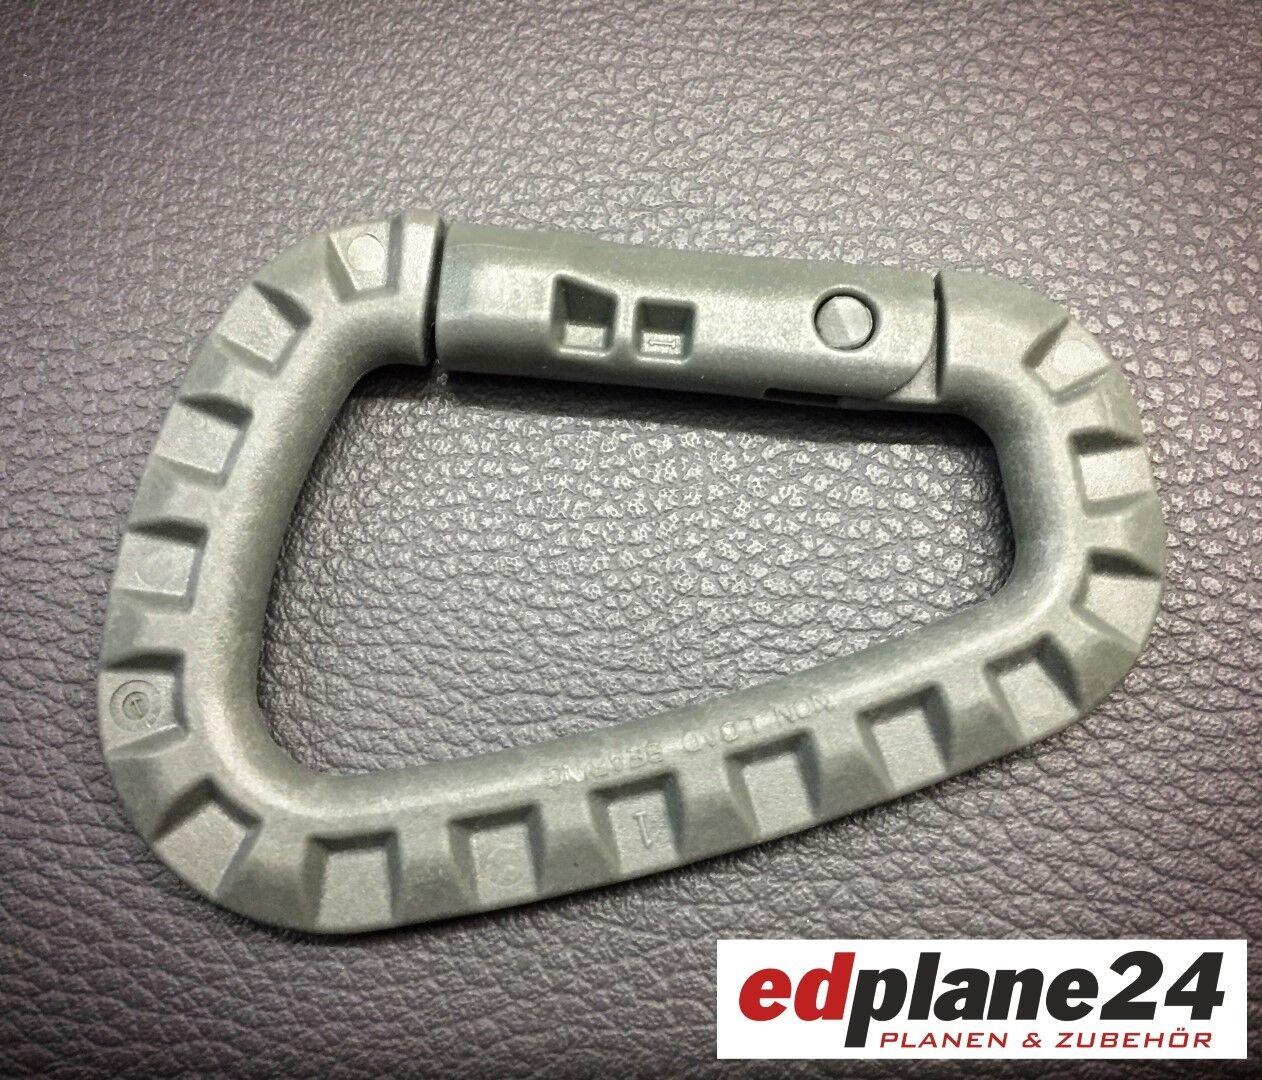 10 x Karabiner Kunststoff Kunststoff Kunststoff ca.olivgrün glasfaserverstärkt Schlüsselanhänger 076700